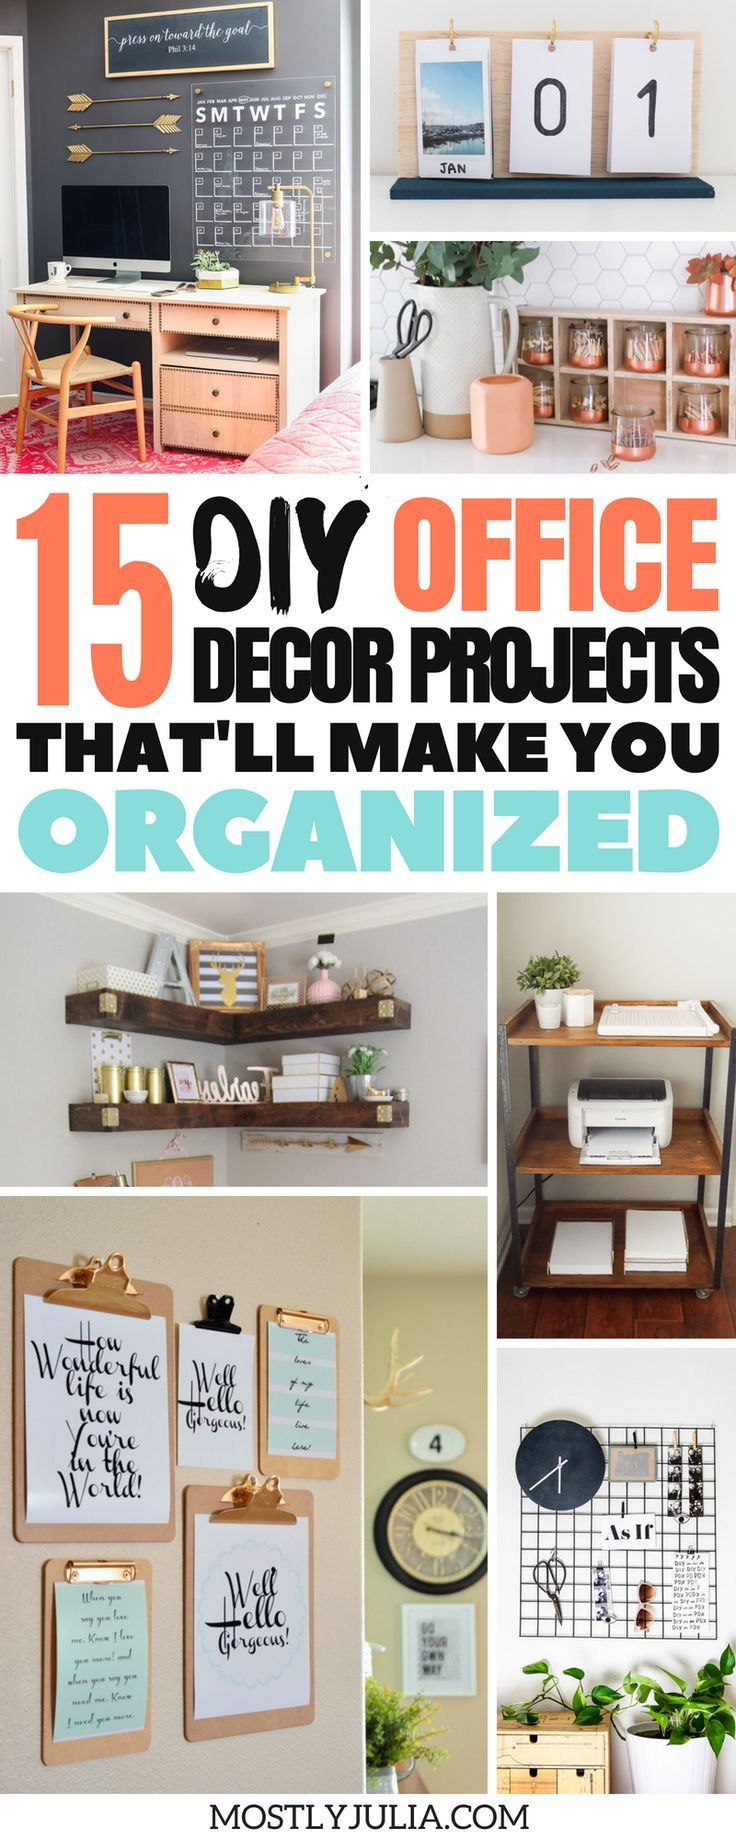 Hugedomains Com Shop For Over 300 000 Premium Domains Diy Office Decor Desk Organization Diy Diy Office Organization